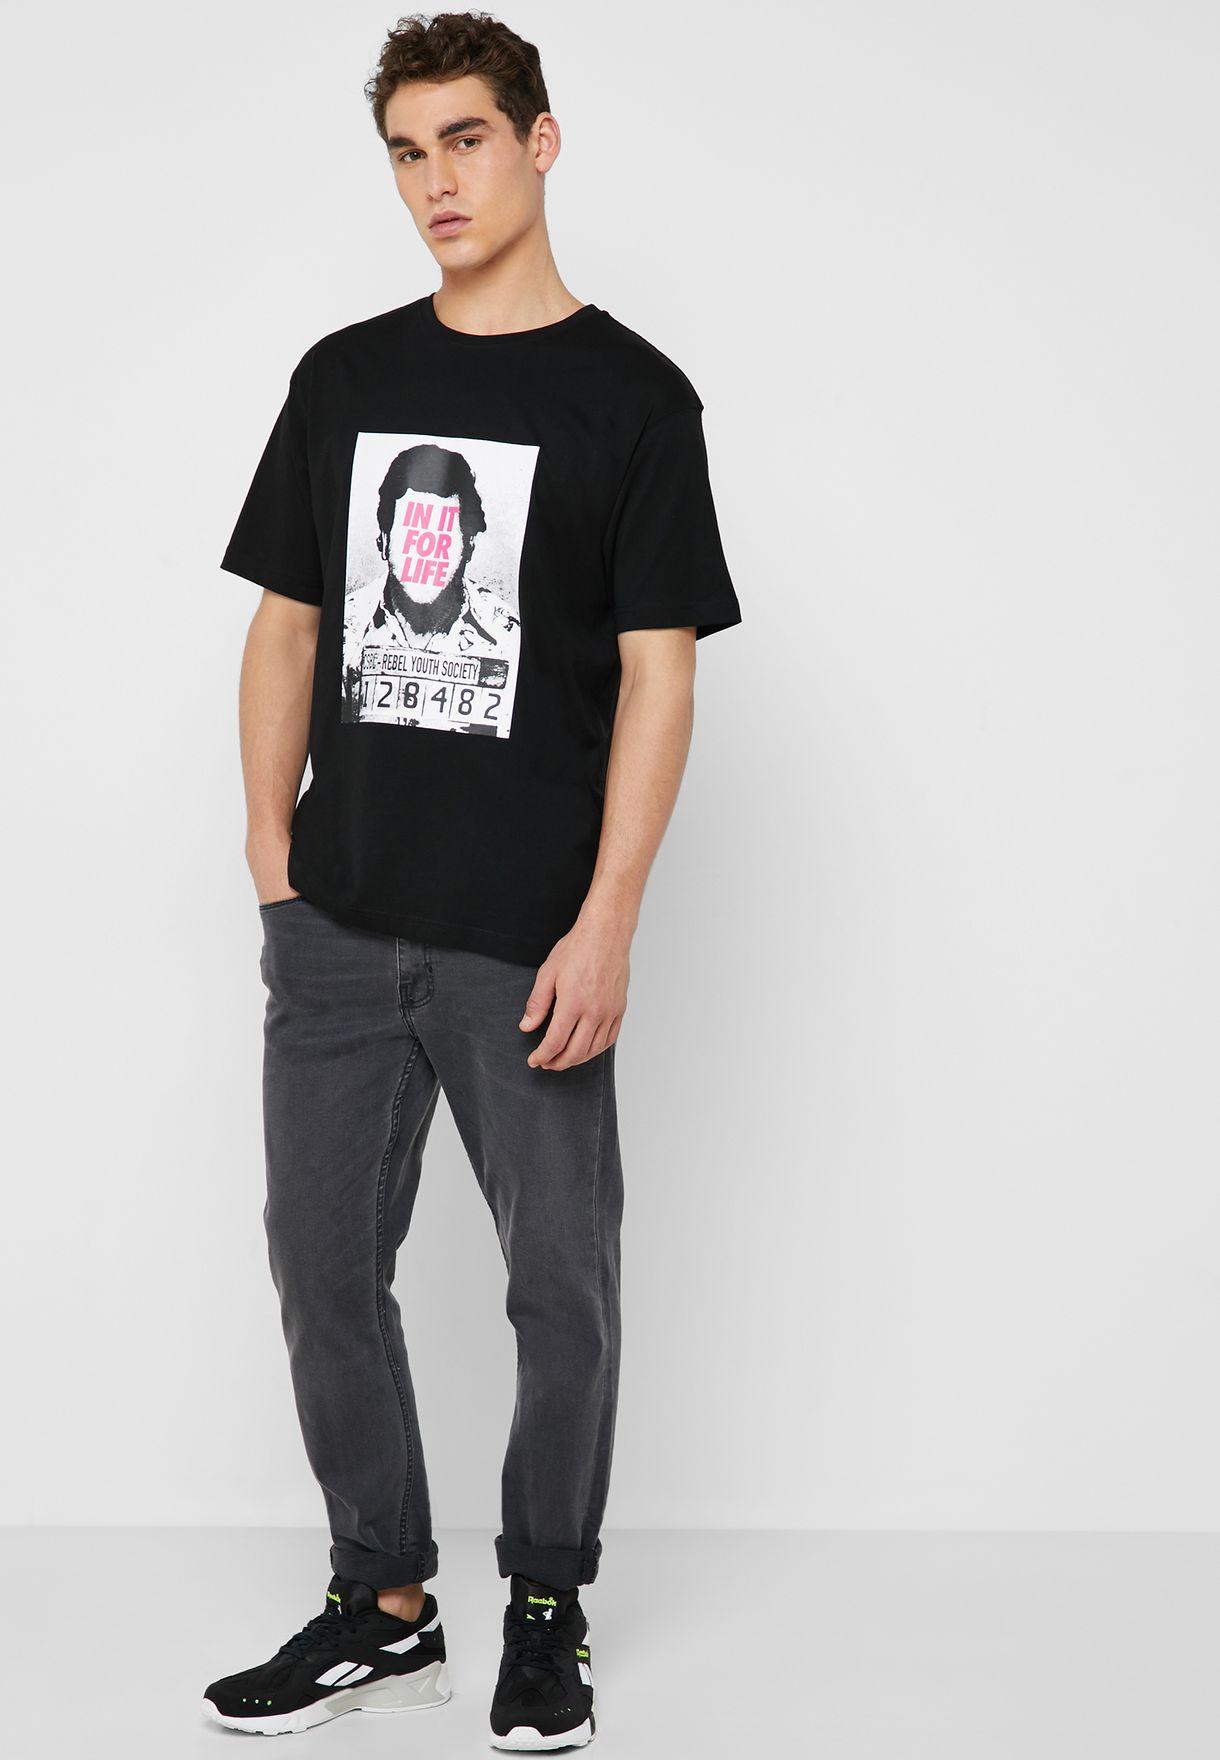 For Life Semi Box T-Shirt